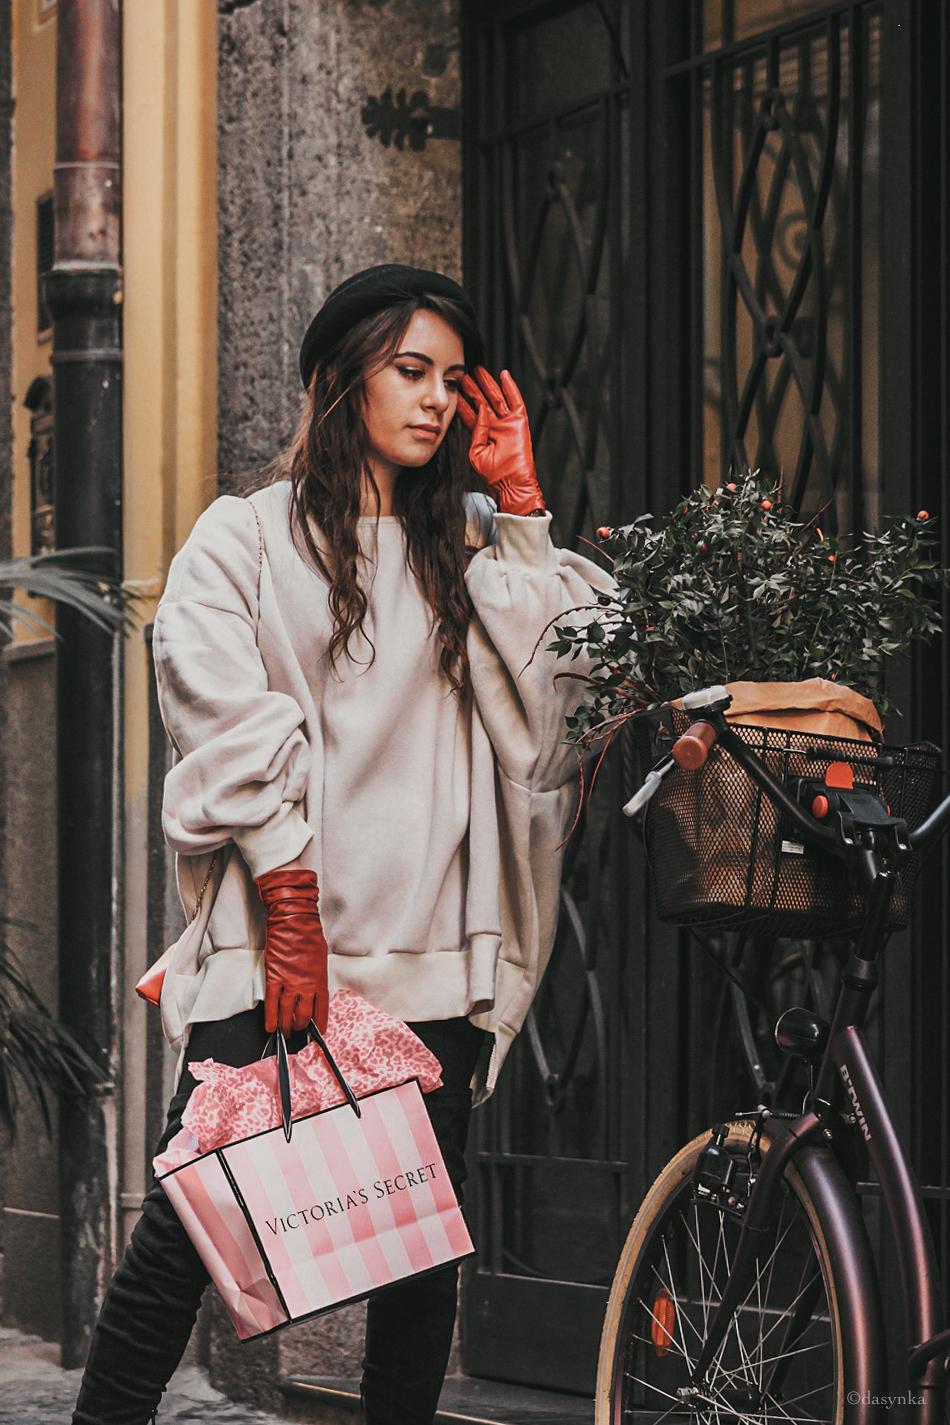 dasynka-fashion-blog-blogger-shooting-model-naples-boots-high-gloves-red-harrods-sweater-bag-hat-pochette-nutcracker-christmas-victoria-secret-white-oversize-overknee-black-ideas-outfit-look-style-chic-elegant-festive